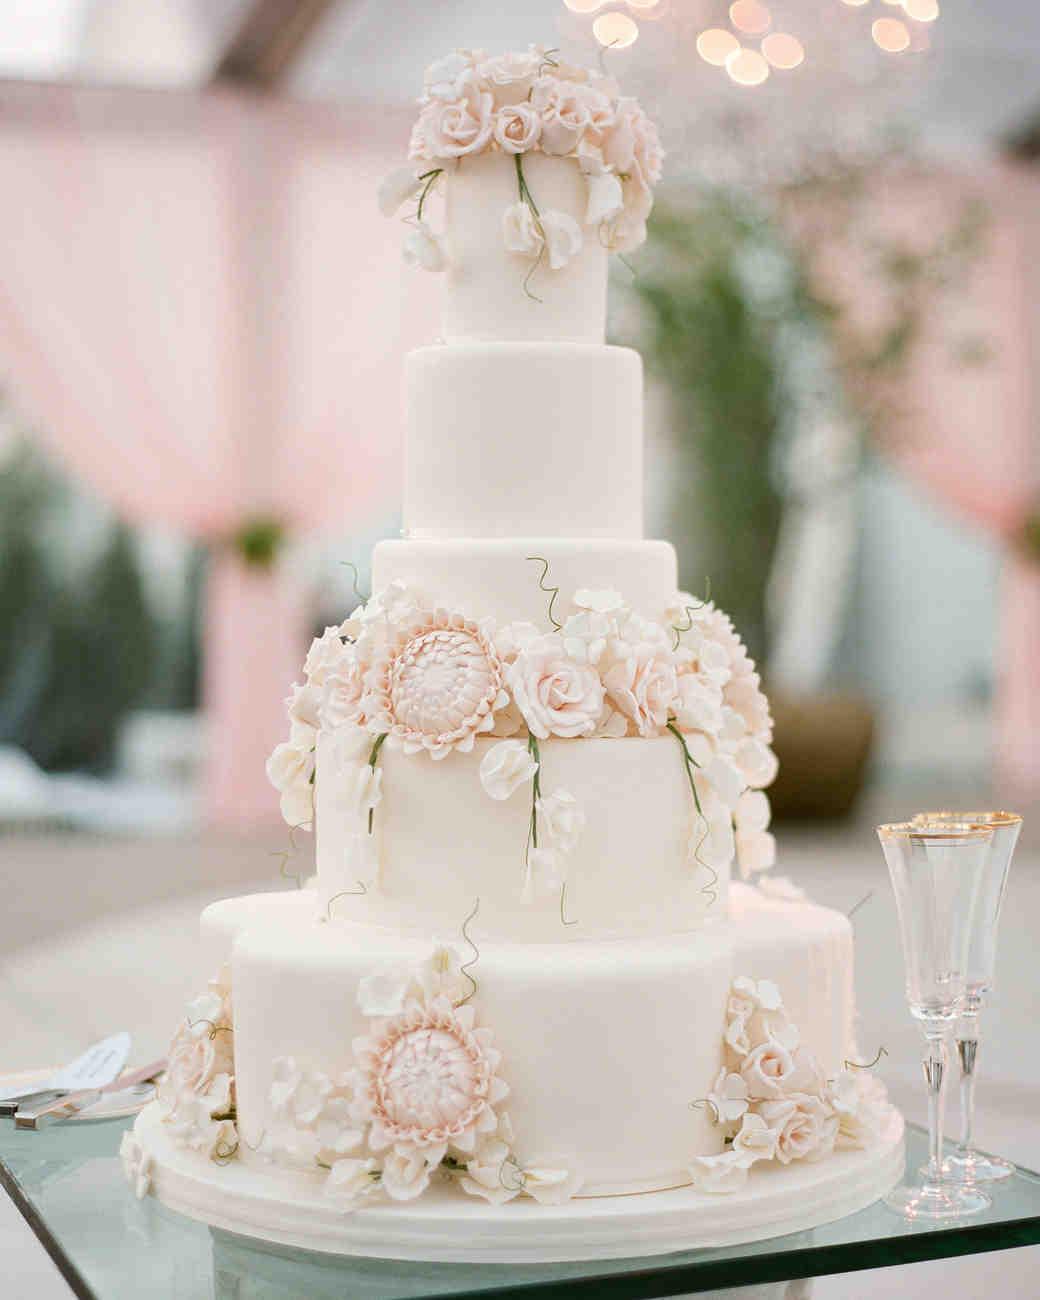 Images Wedding Cakes  7 Delicious Vegan Wedding Cakes